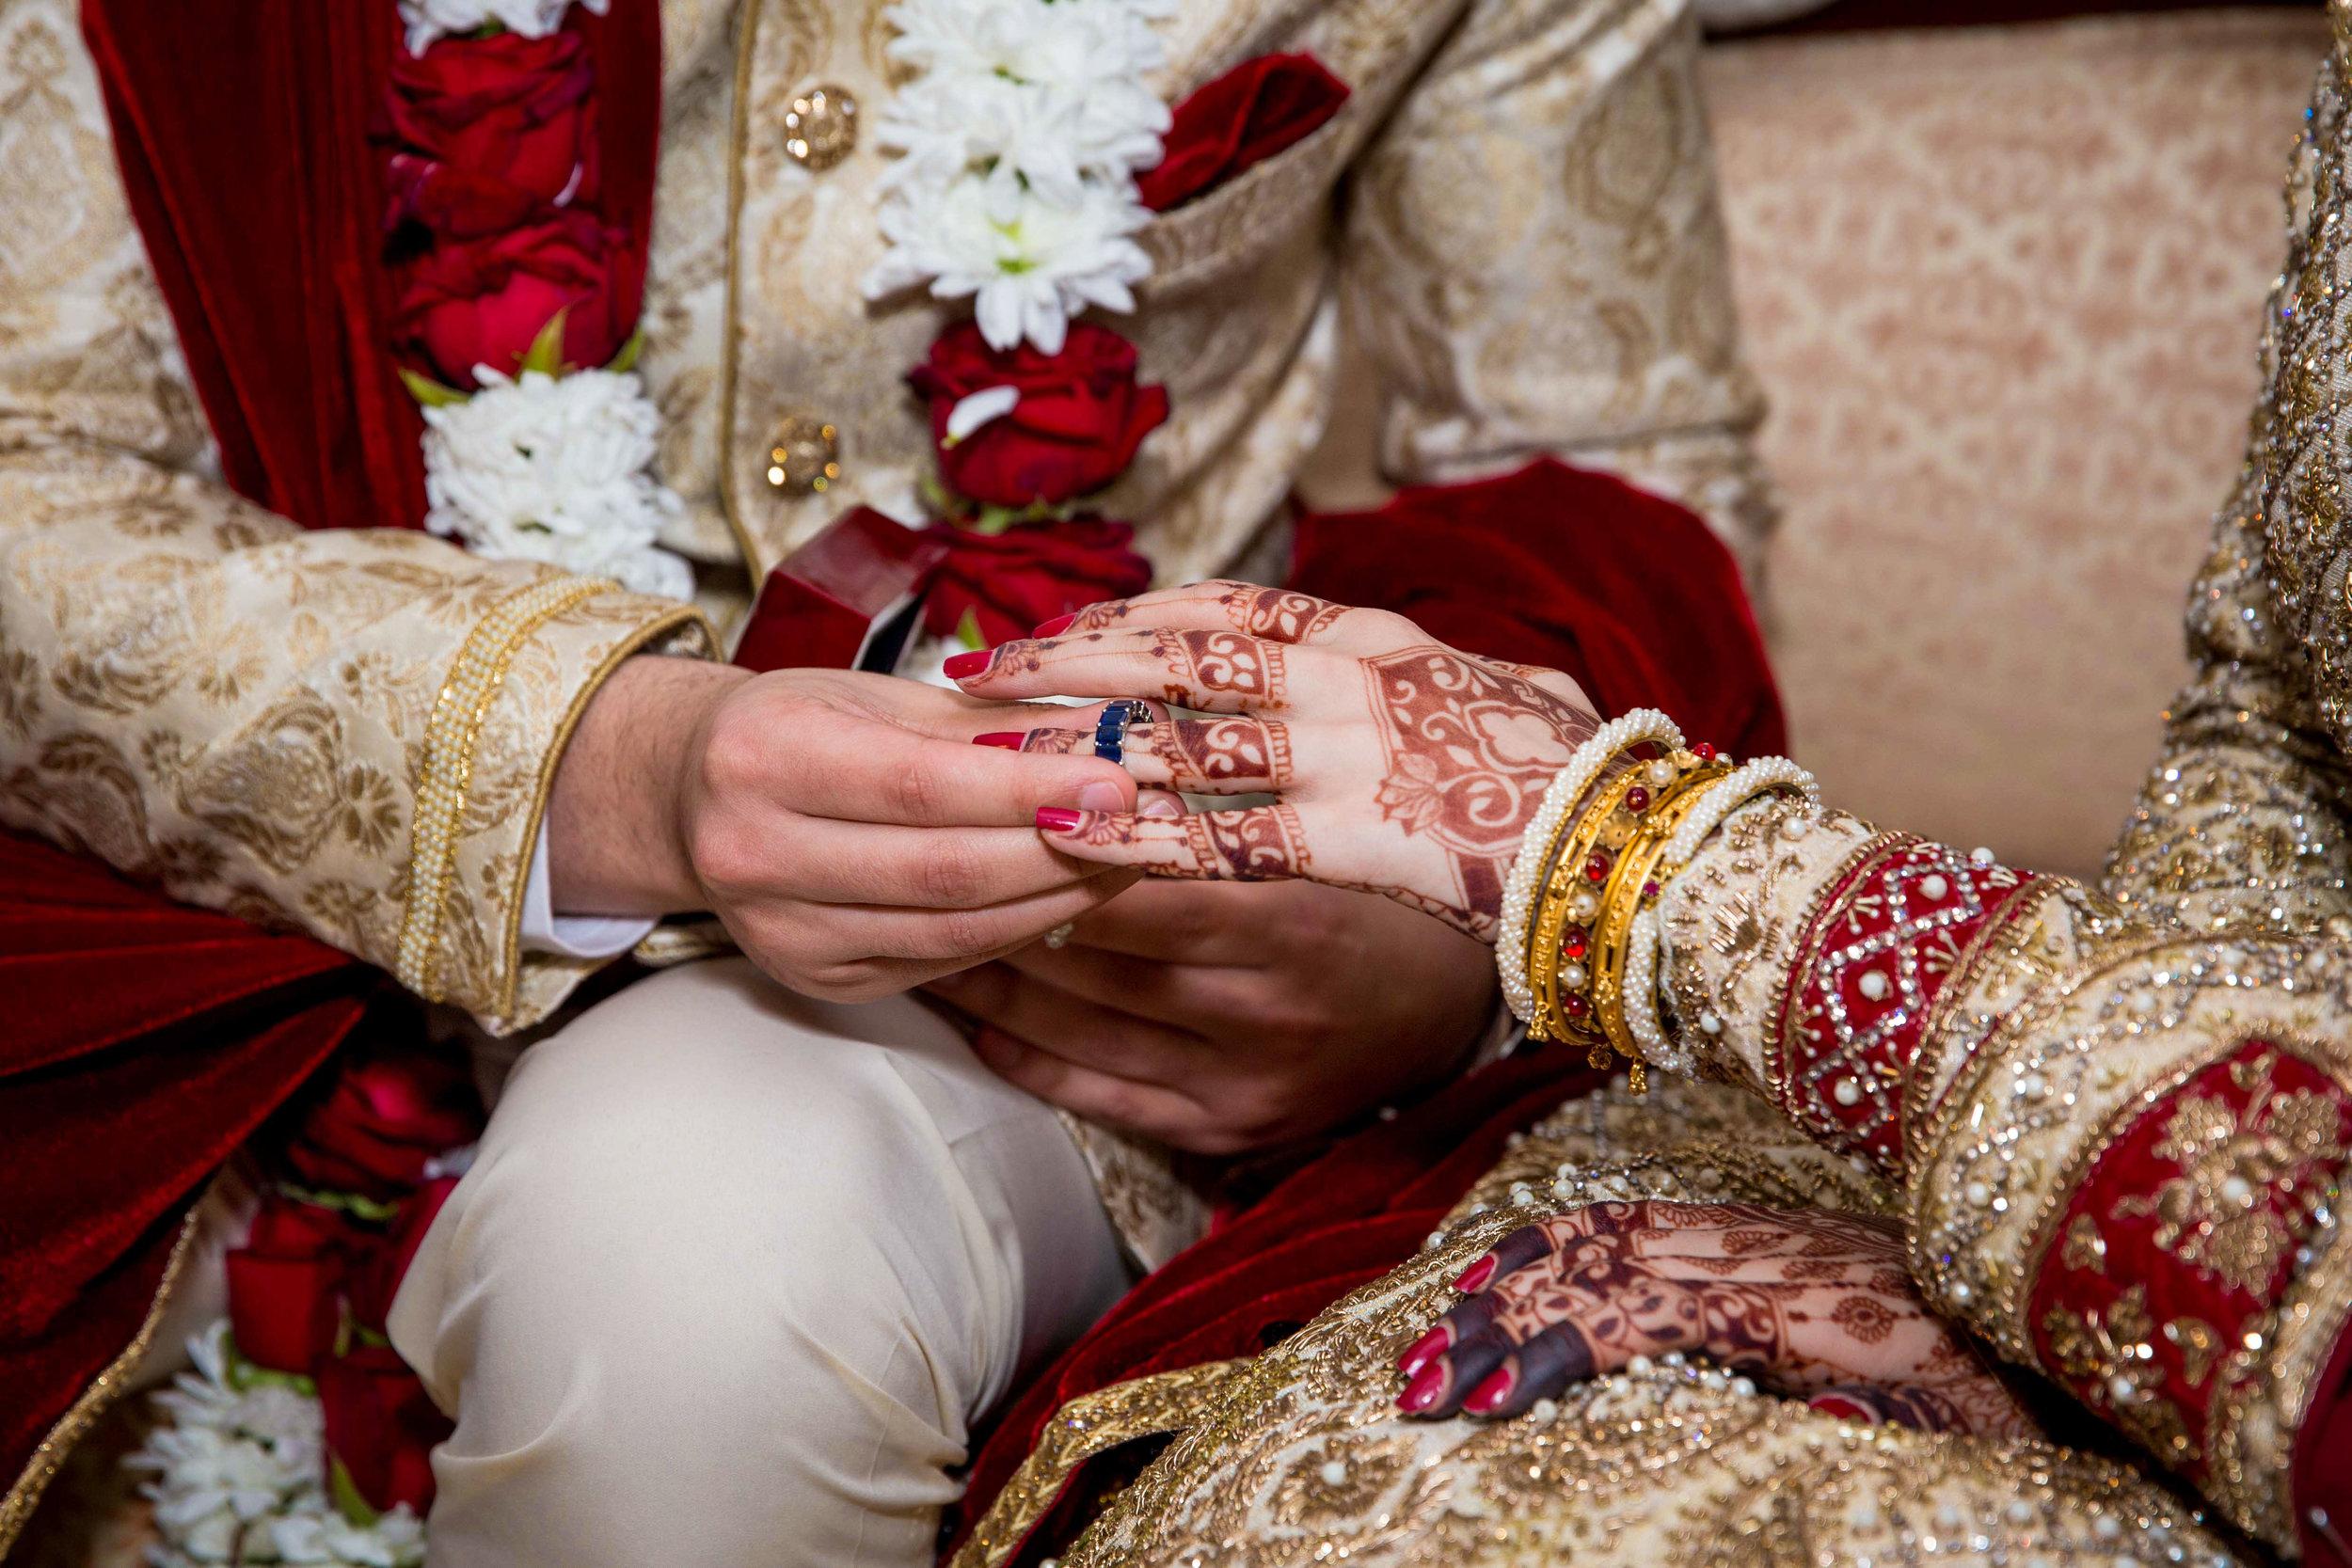 Macdonald-Berystede-Hotel-wedding-female-asian-wedding-photographer-london-natalia-smith-photography-75-2.jpg